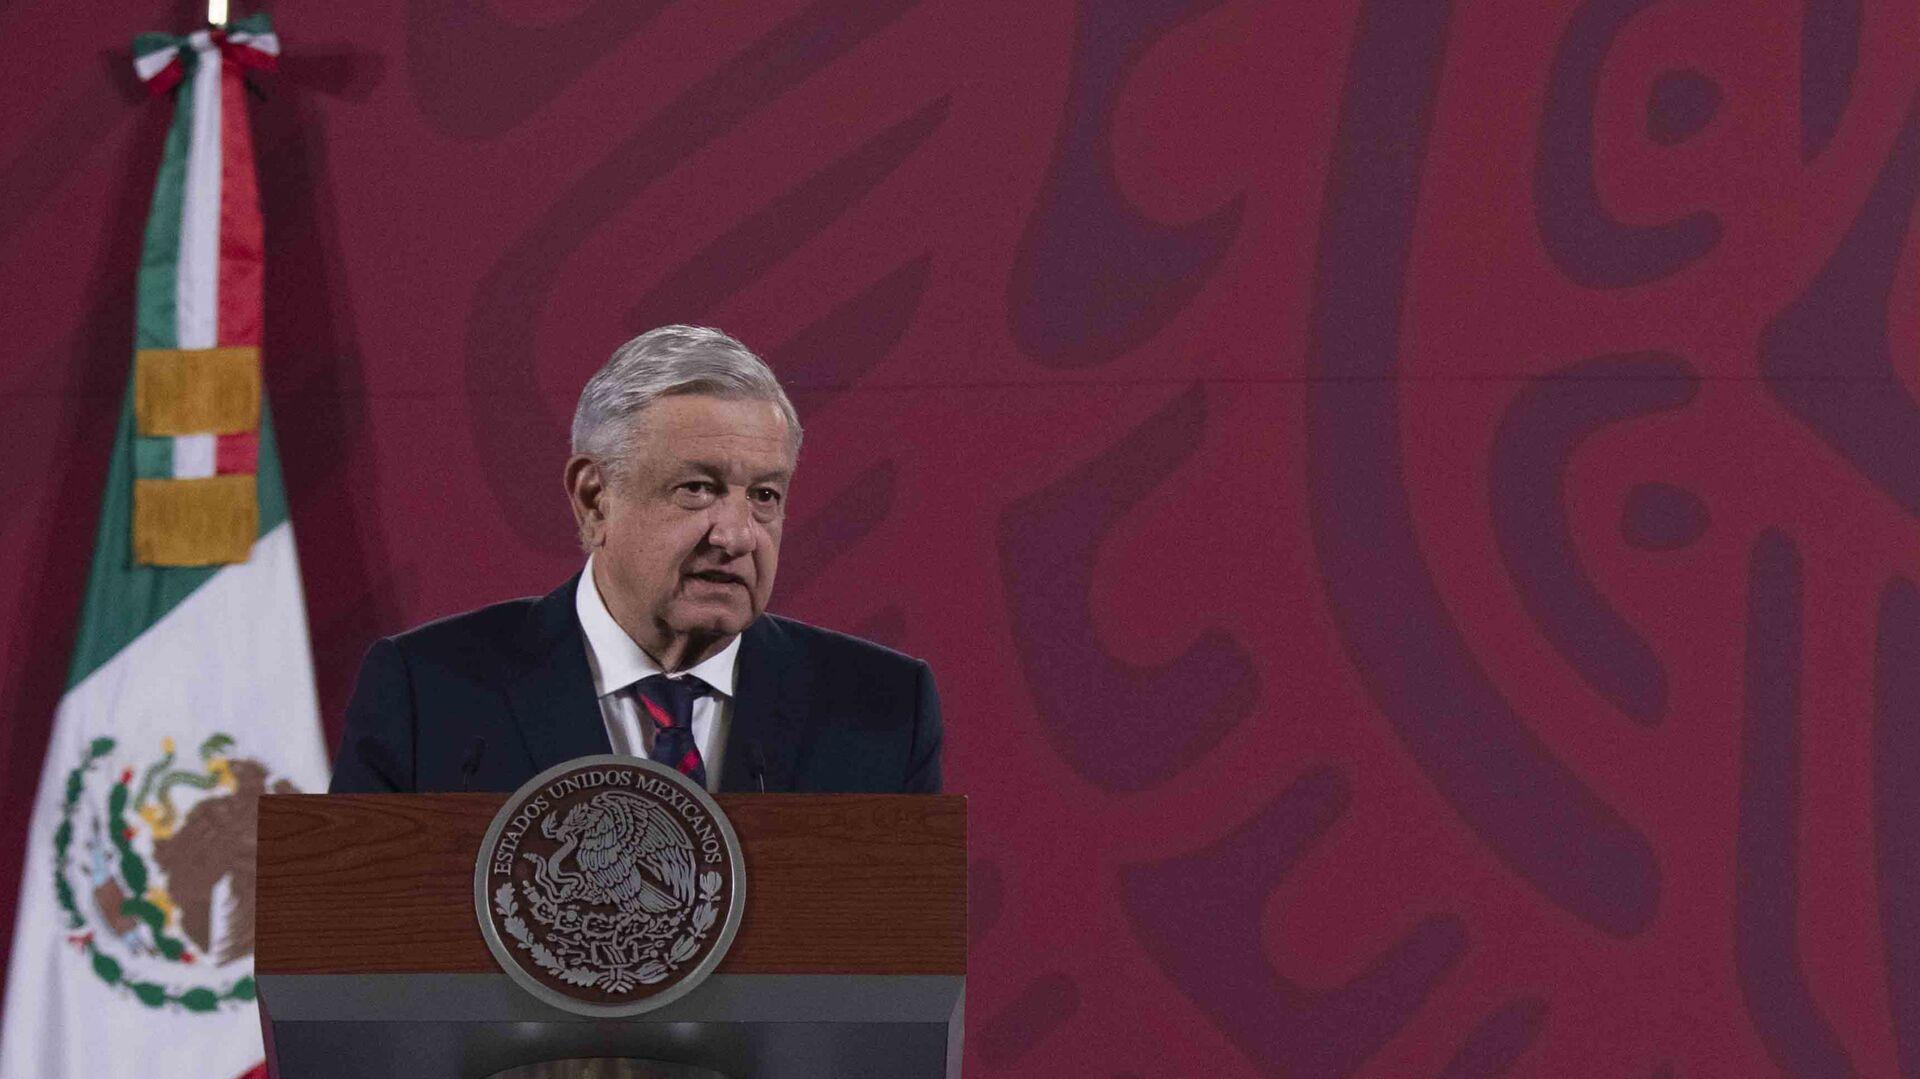 El presidente de México, Andrés Manuel López Obrador - Sputnik Mundo, 1920, 03.03.2021